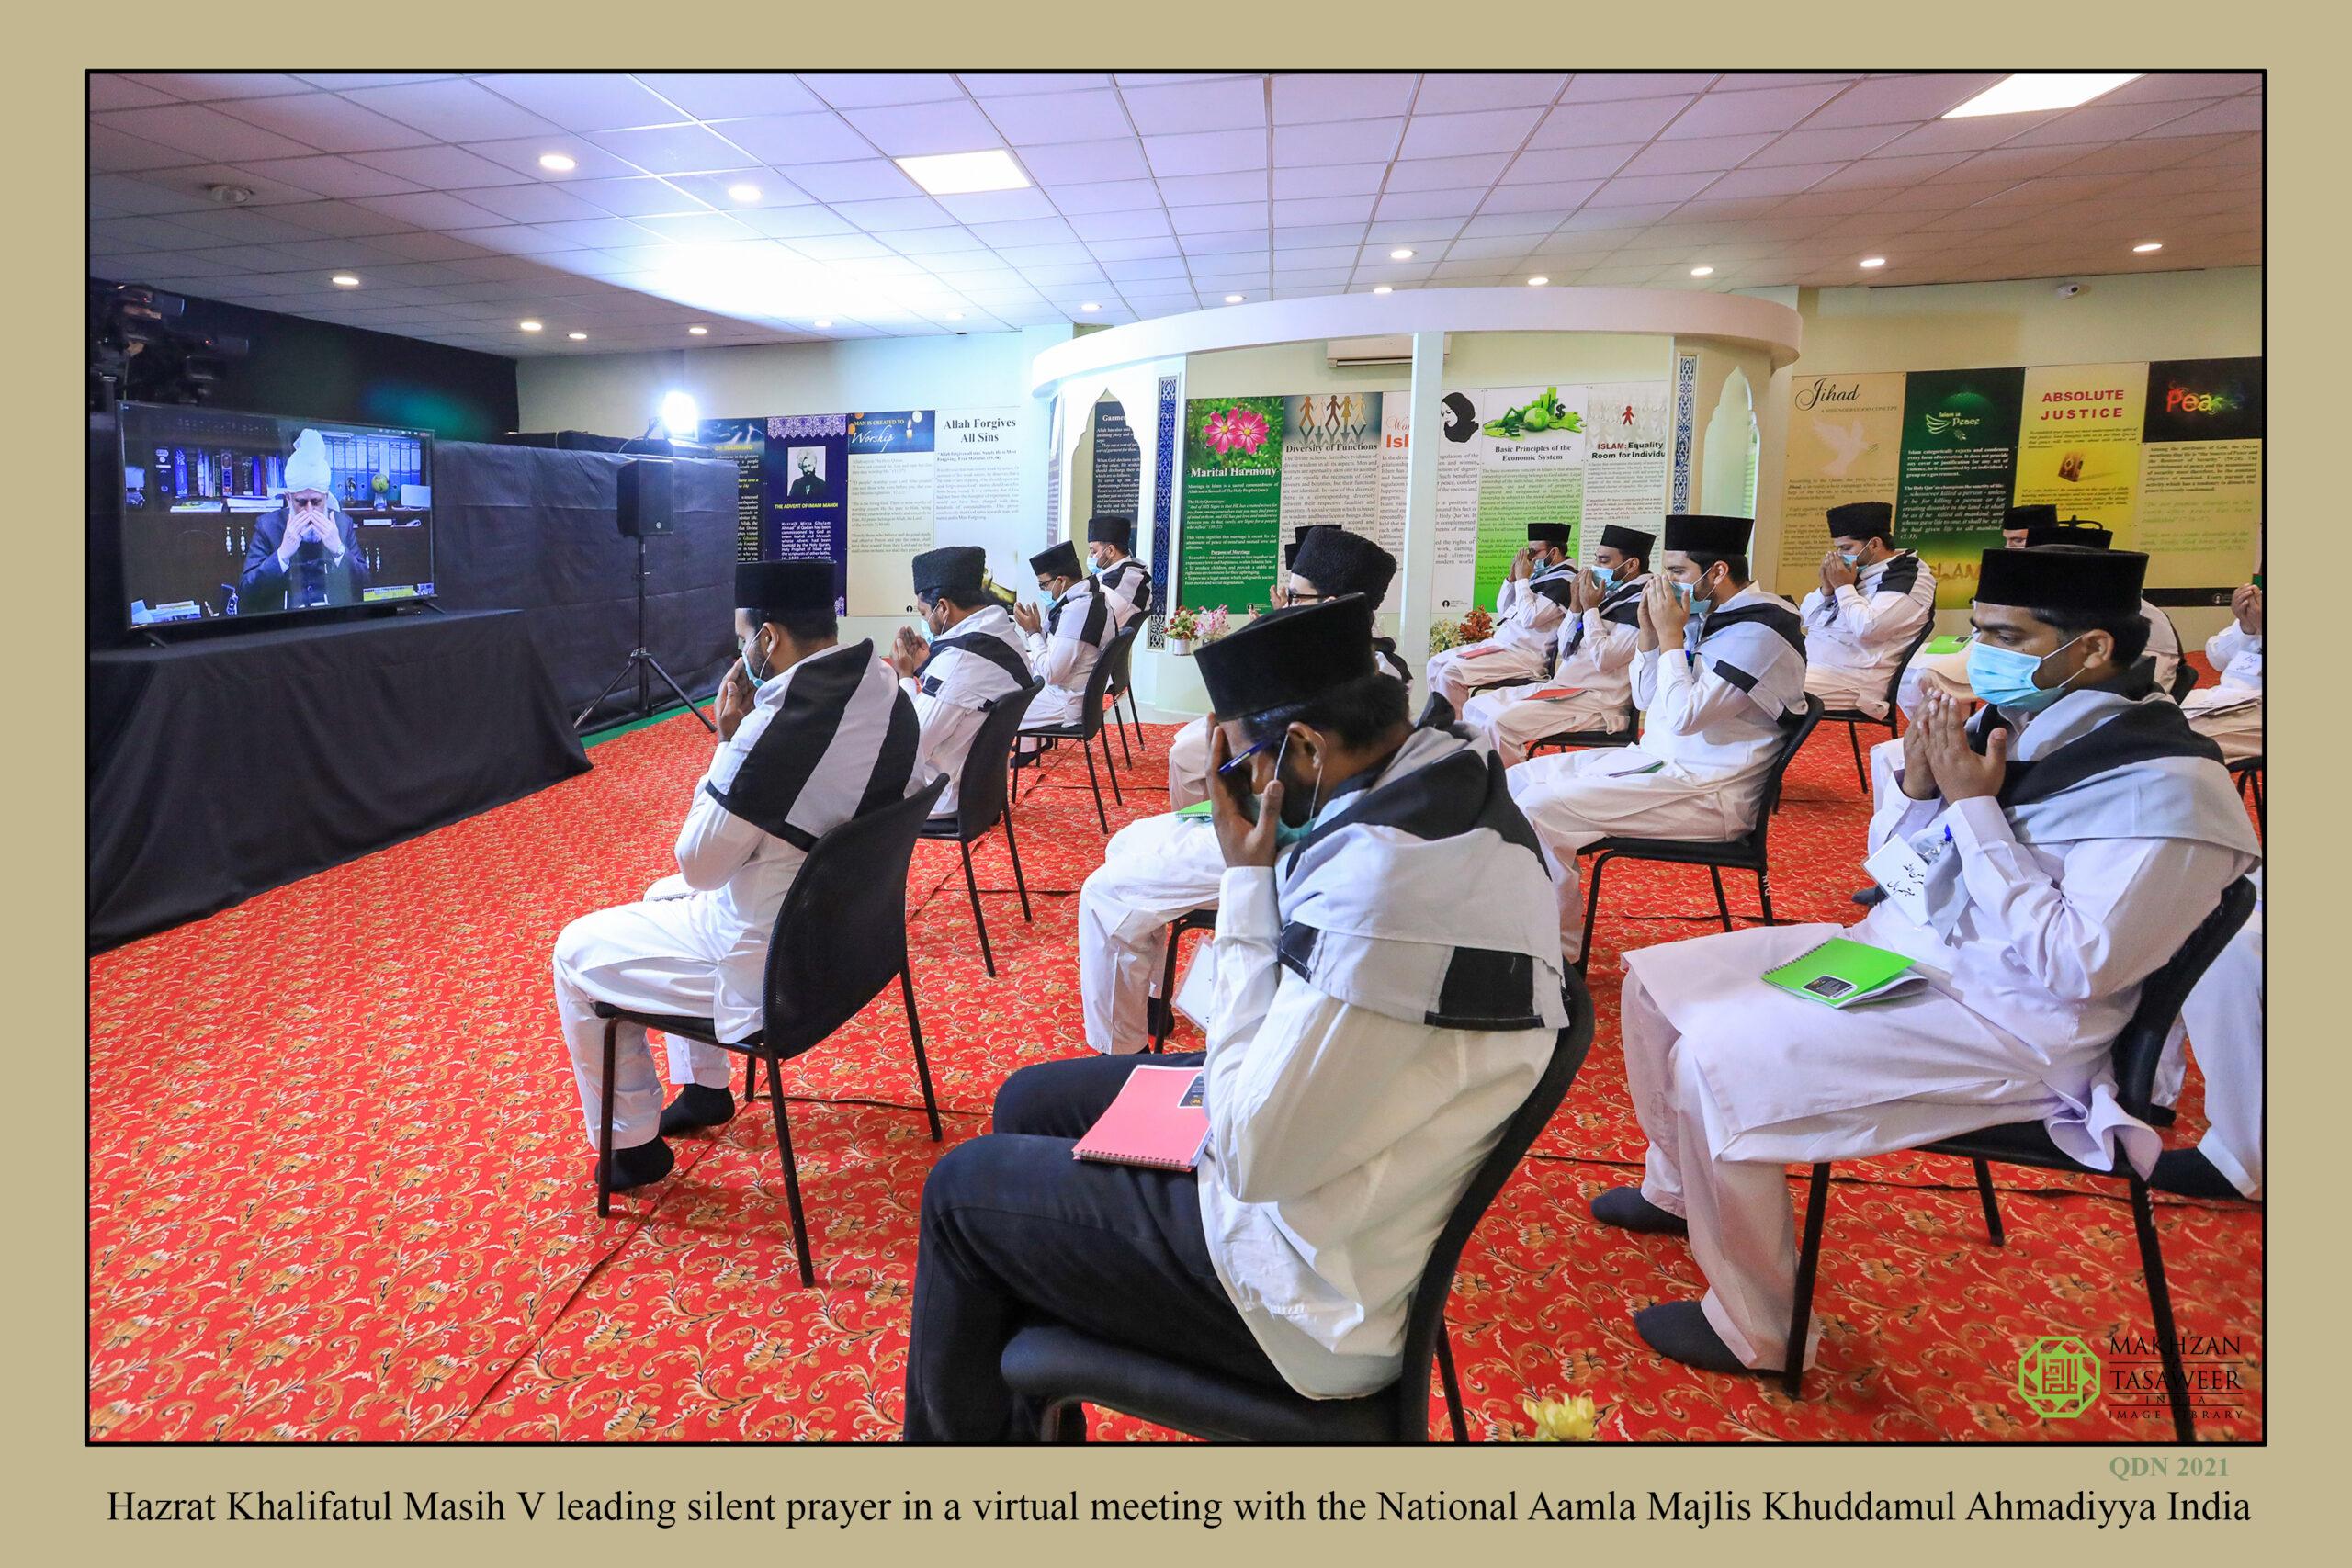 Hazrat Khalifatul Masih V grants a virtual meeting to the national Aamla Majlis Khuddamul Ahmadiyya India 004